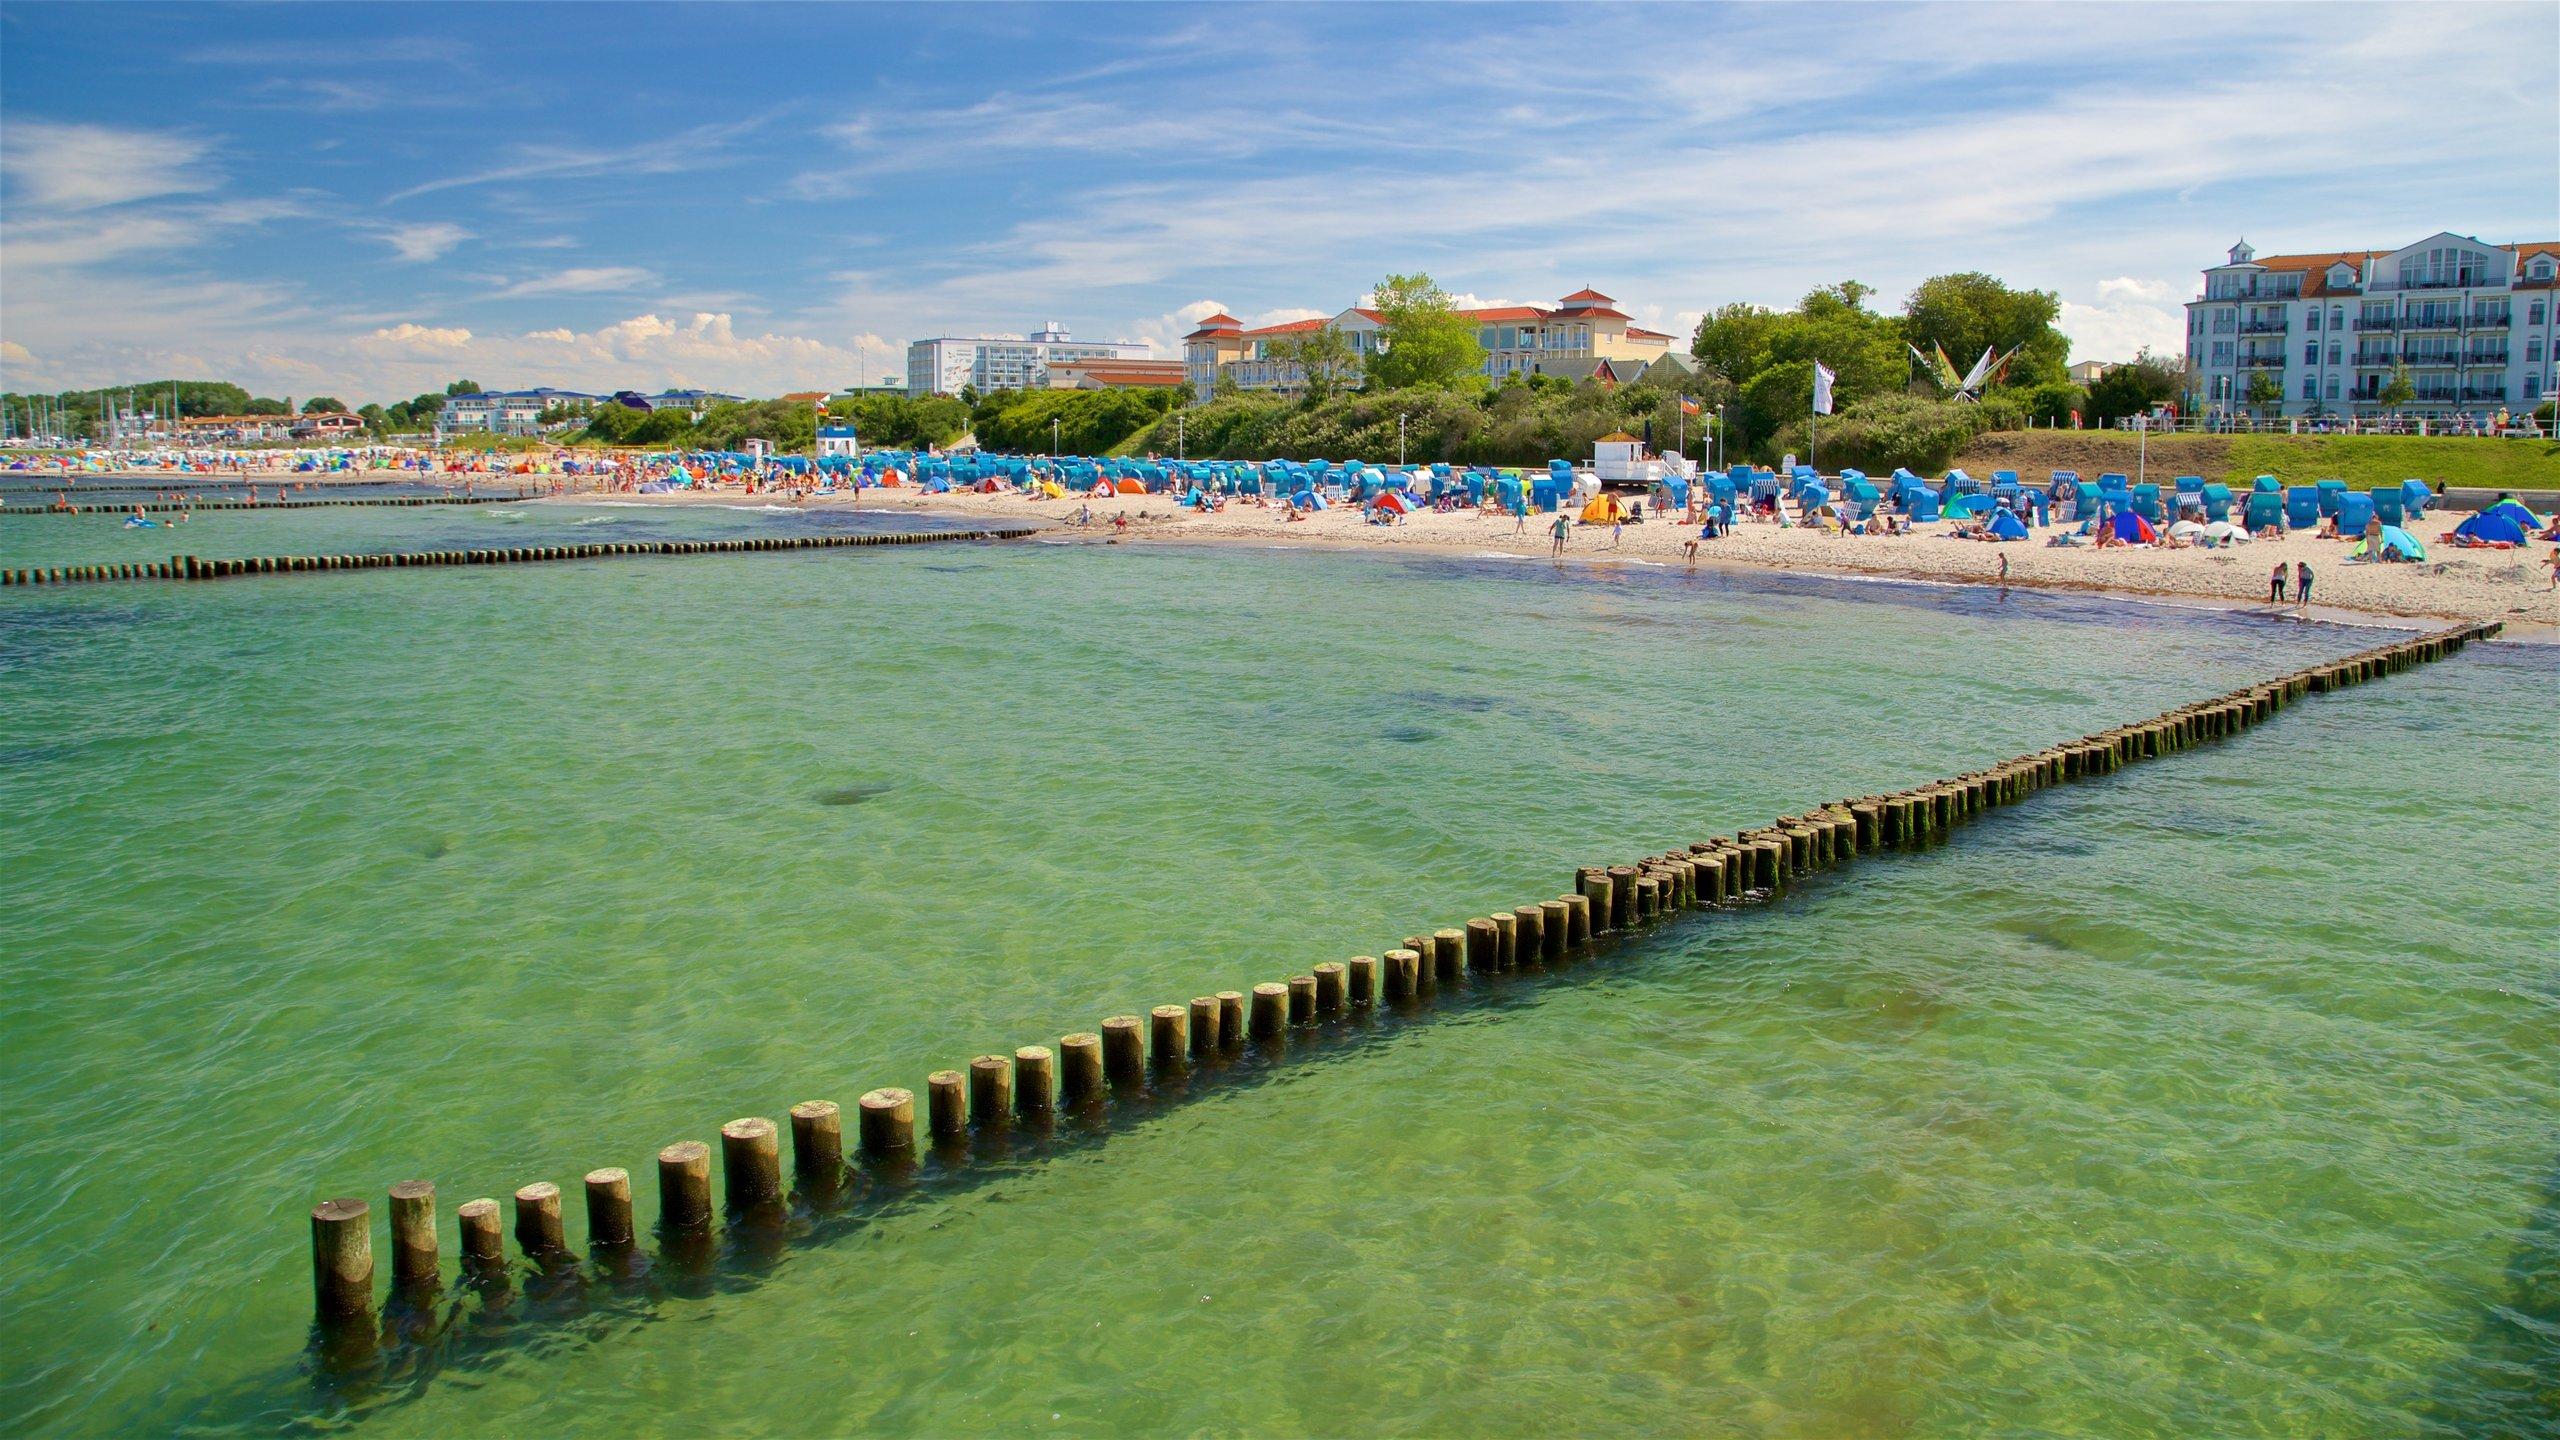 Kuehlungsborn Beach, Kuehlungsborn, Mecklenburg-West Pomerania, Germany